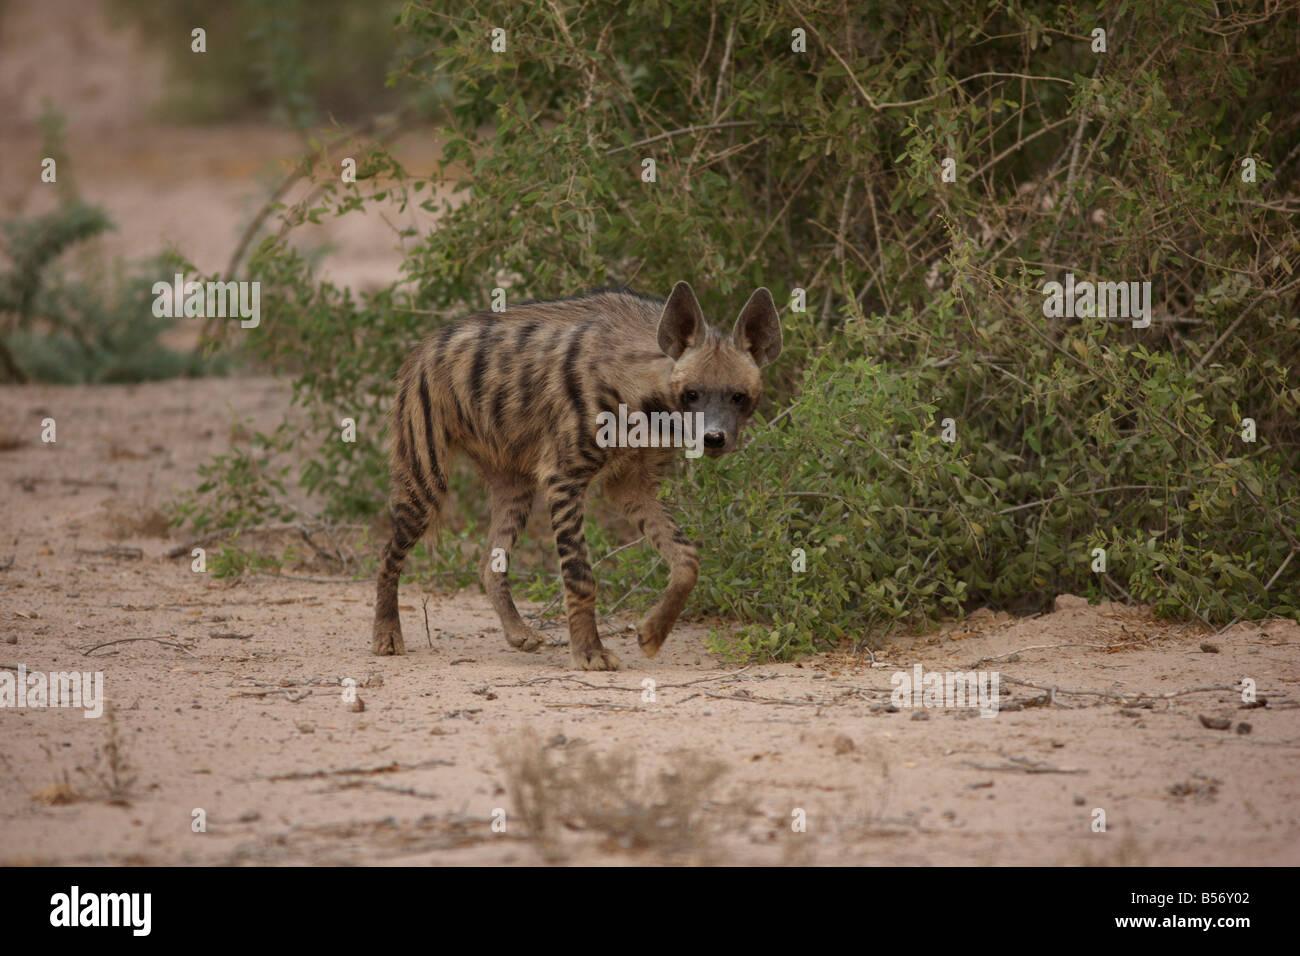 hyena Sir Bani Yas Island private game reserve in the persian gulf near Abu Dhabi United Arab Emirates Stock Photo